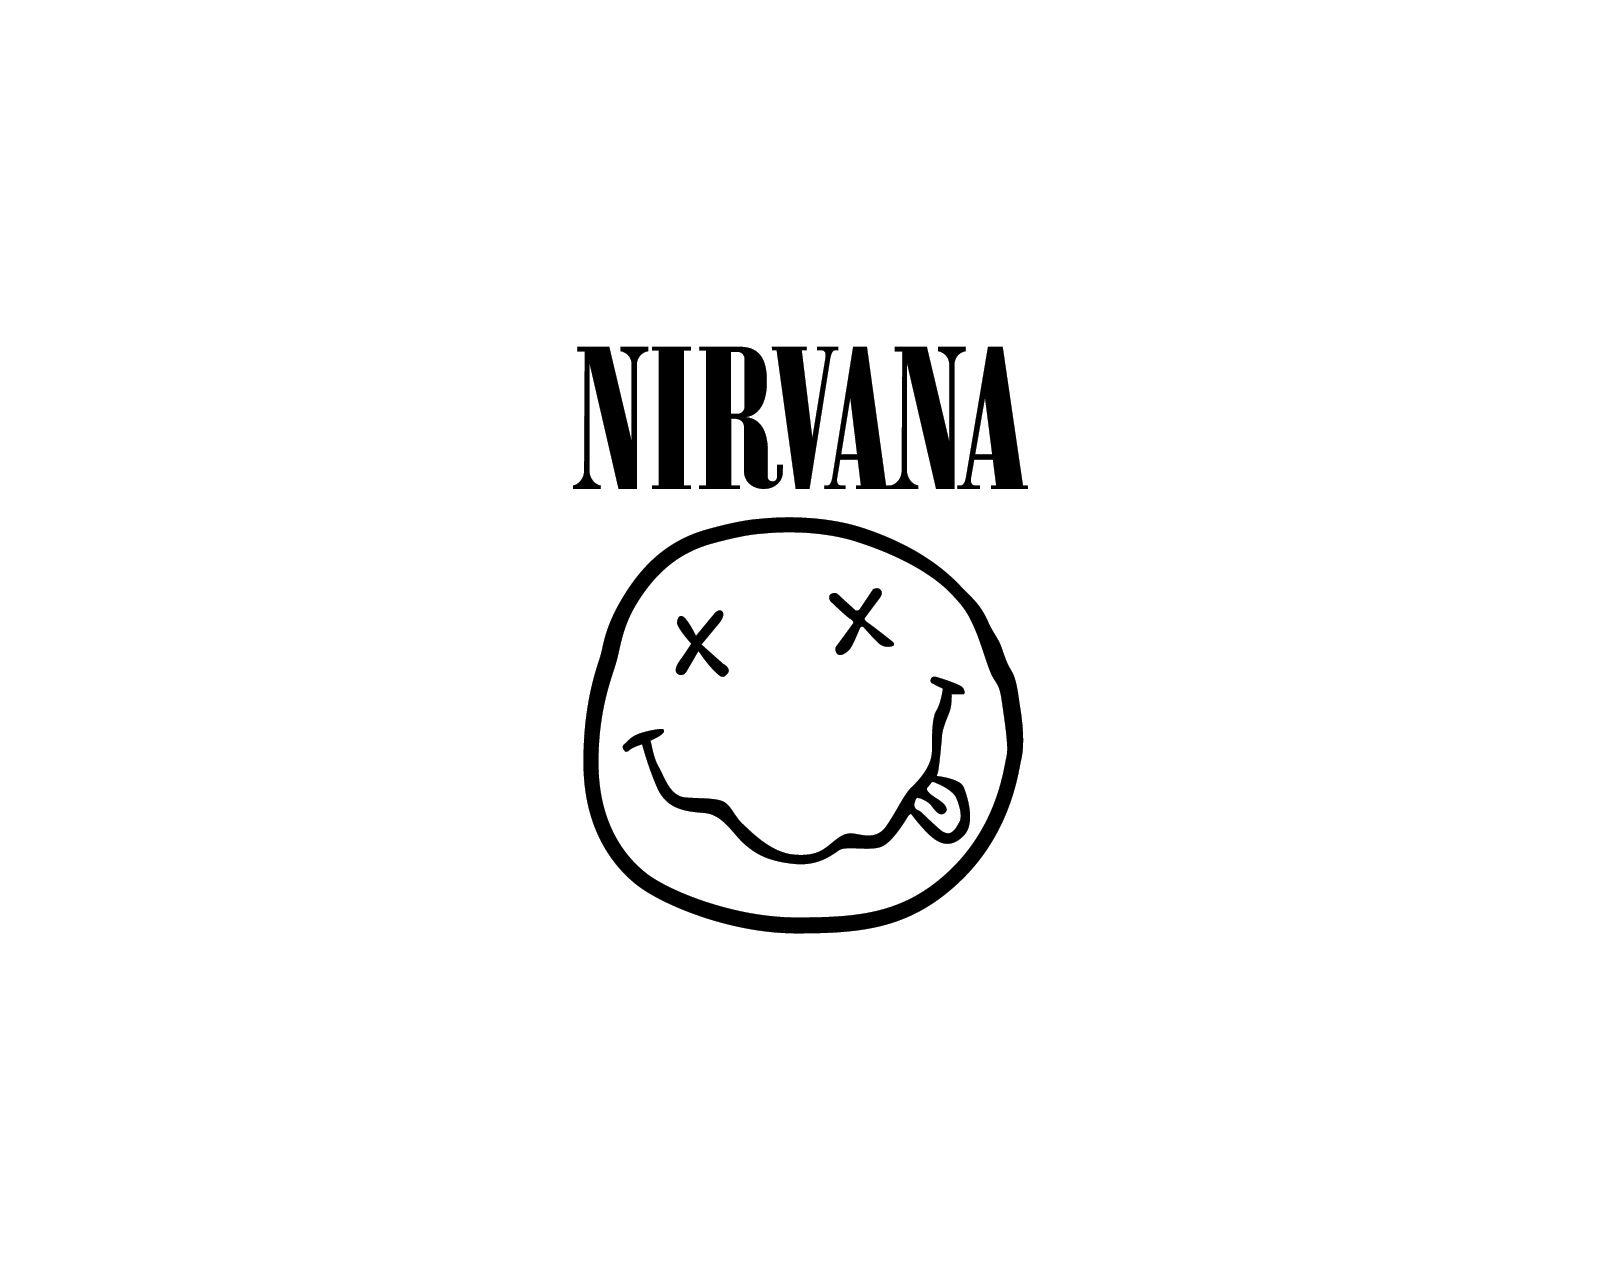 Nirvana Logo Nirvana Logo Nirvana Nirvana Tattoo